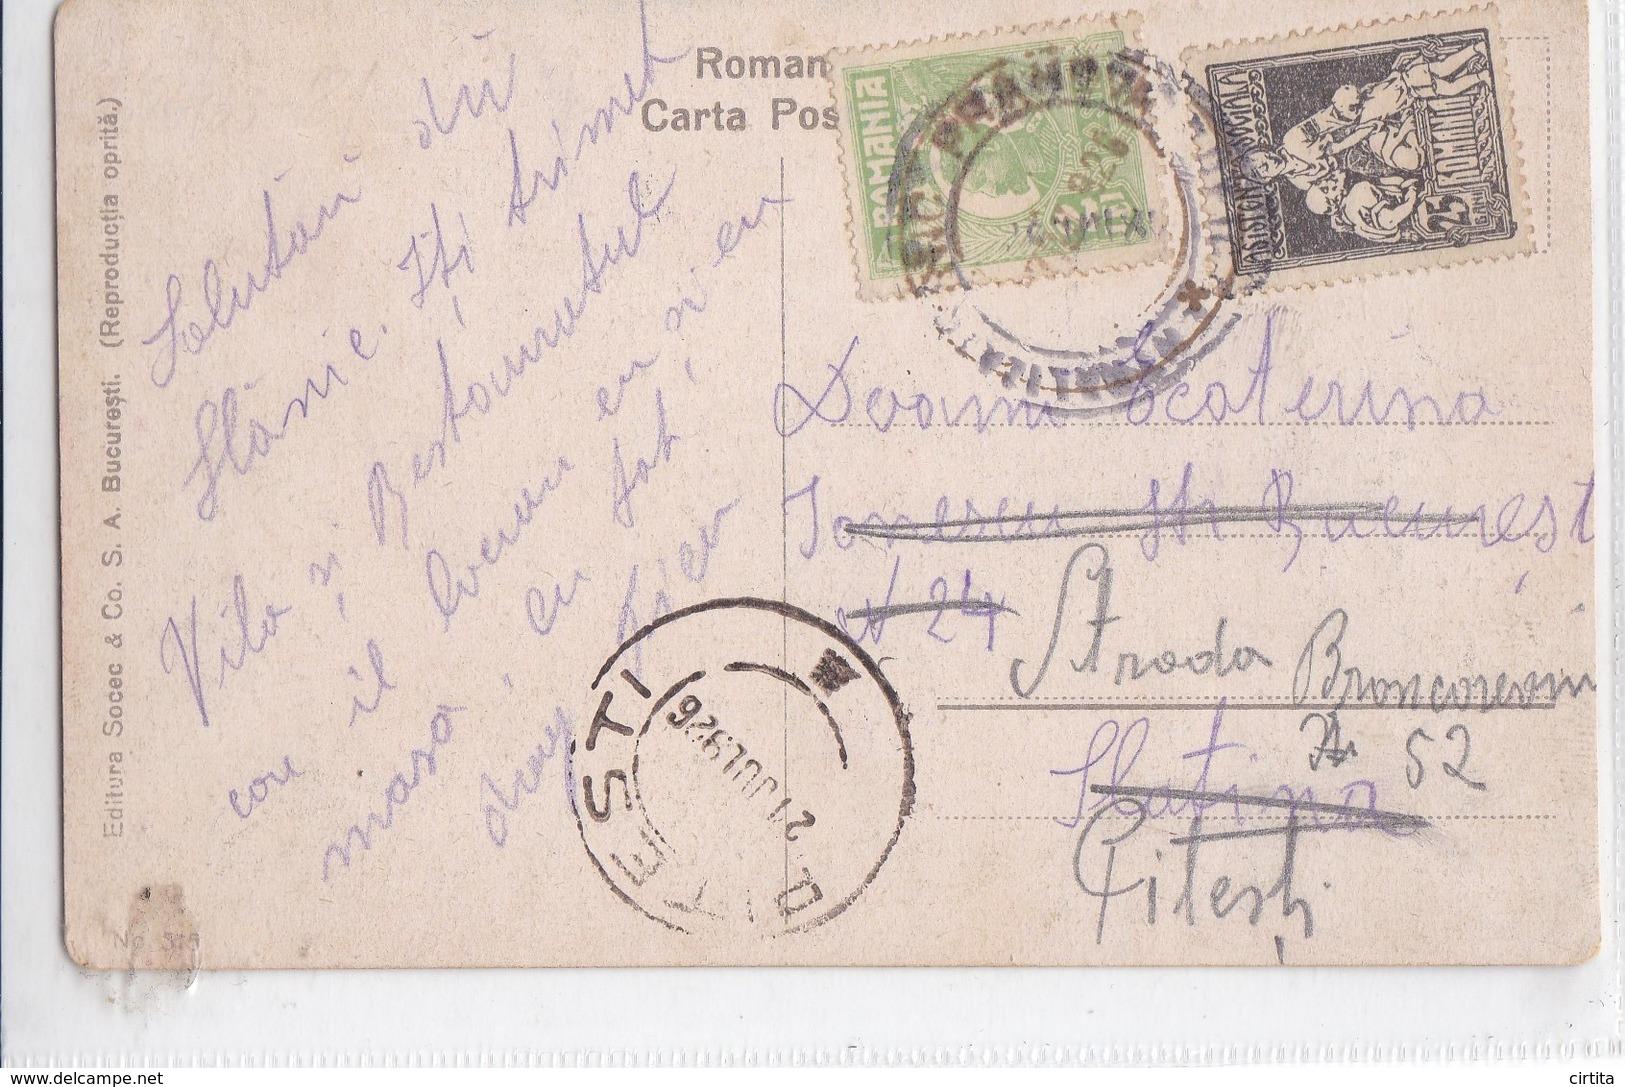 ROMANIA SLANIC RESTAURANTUL VILA REGALA - Romania